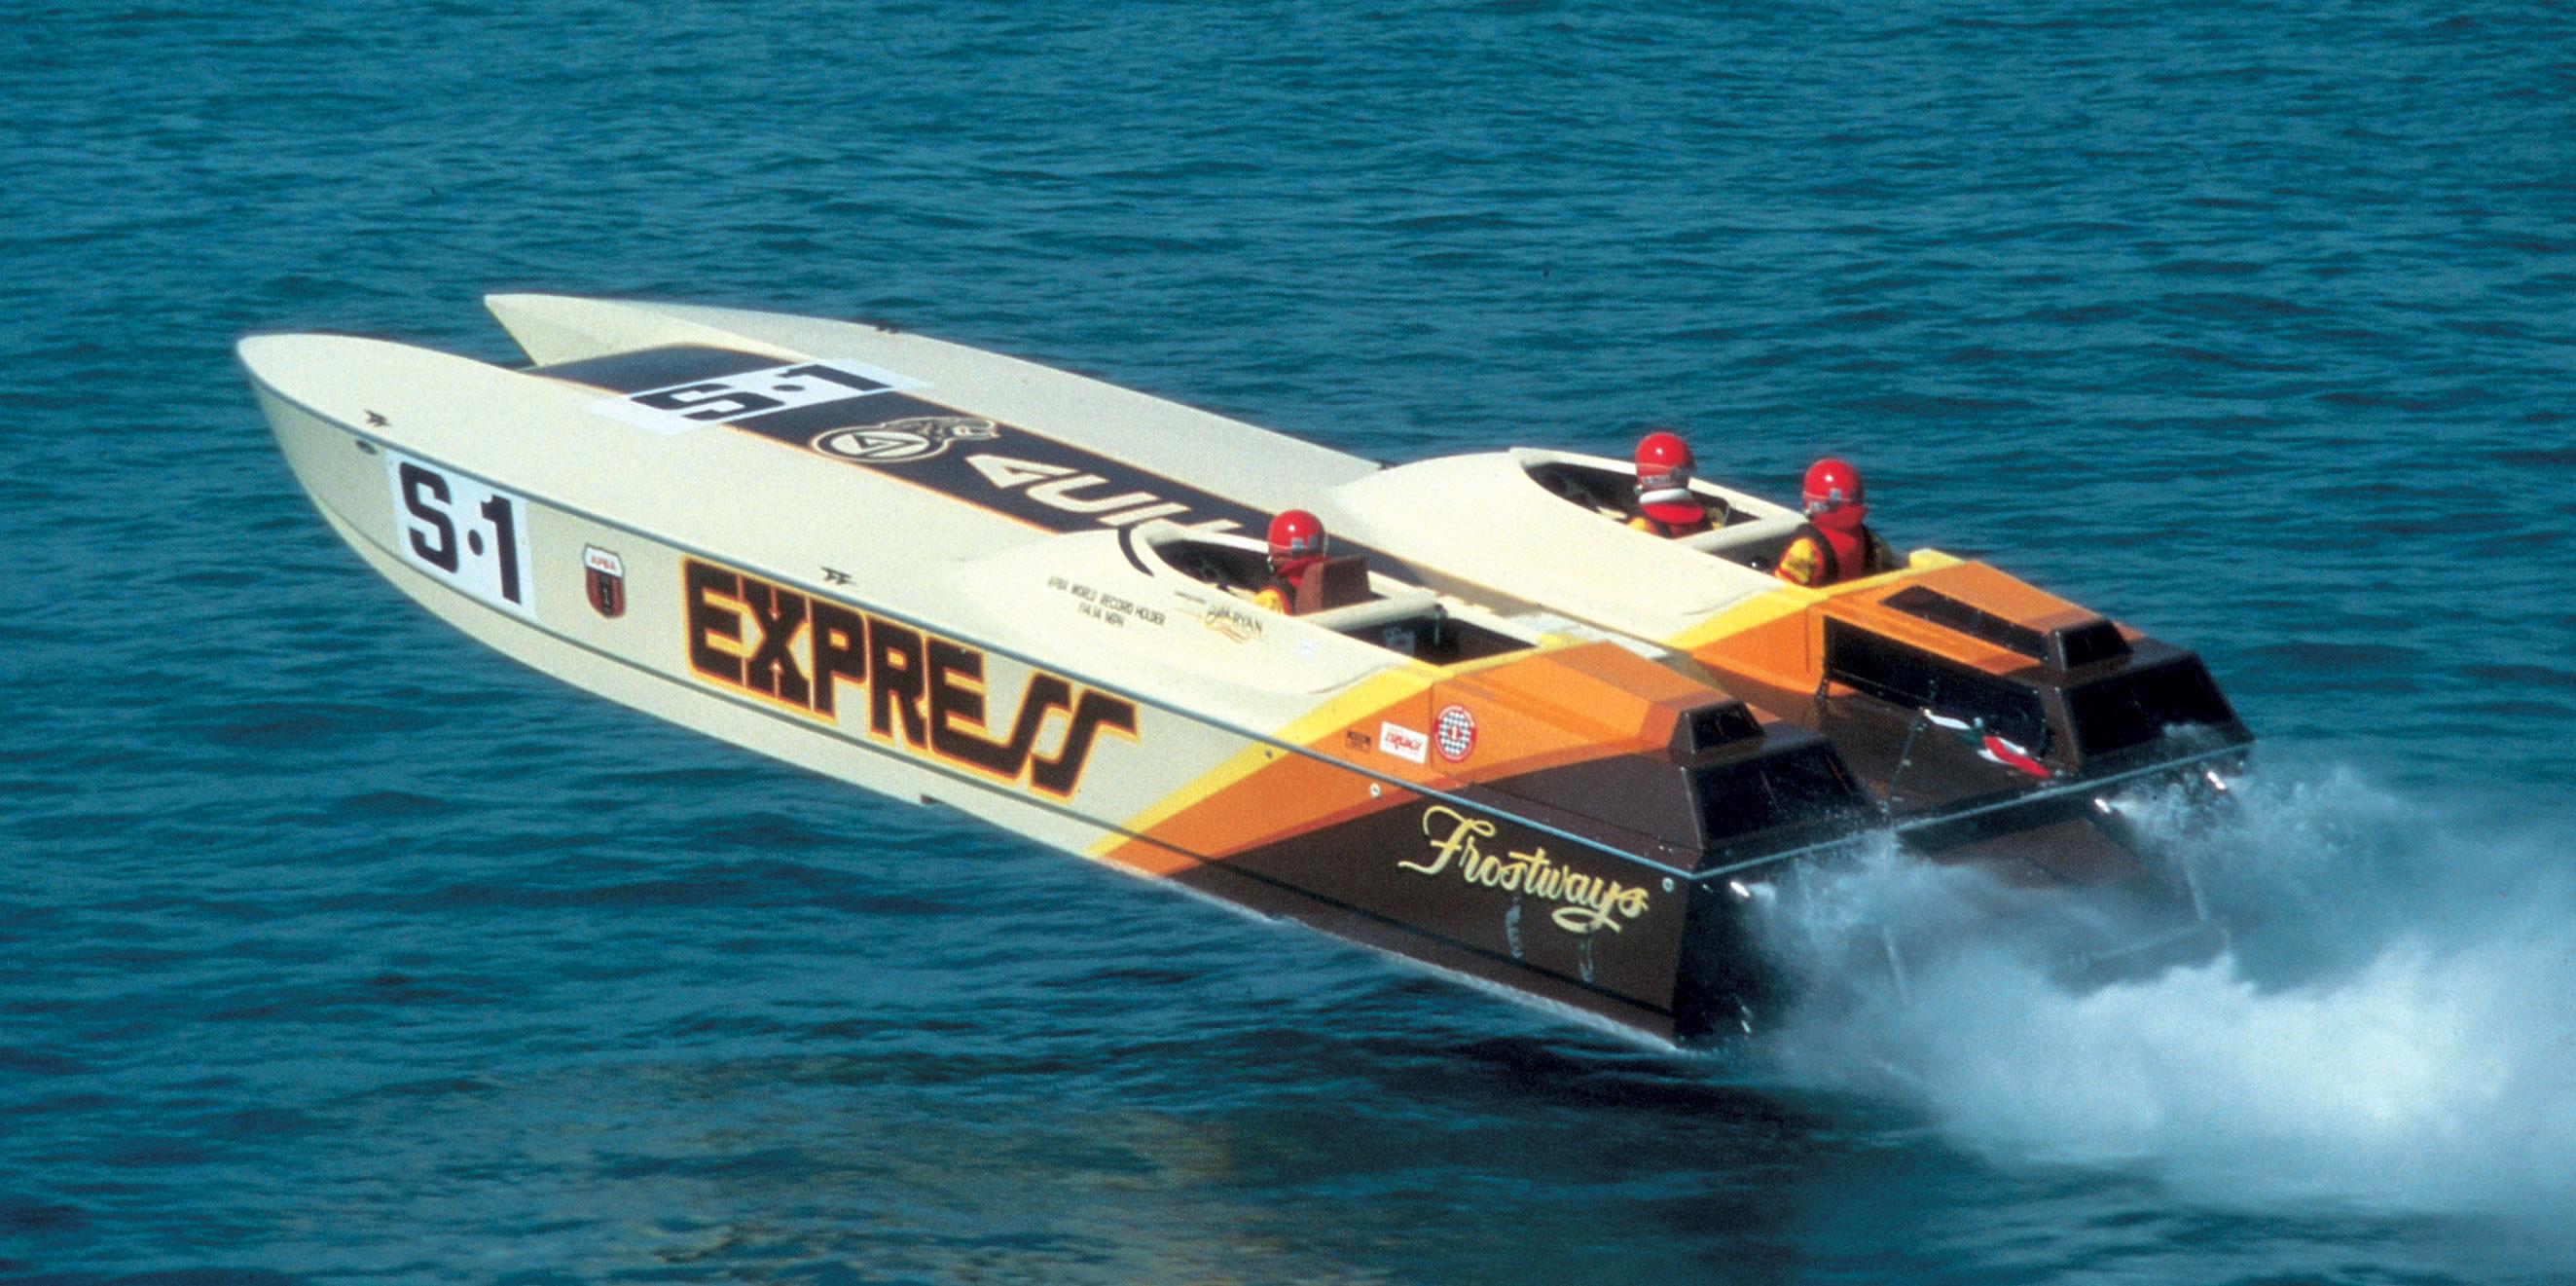 Butch Ryan's 'Express'